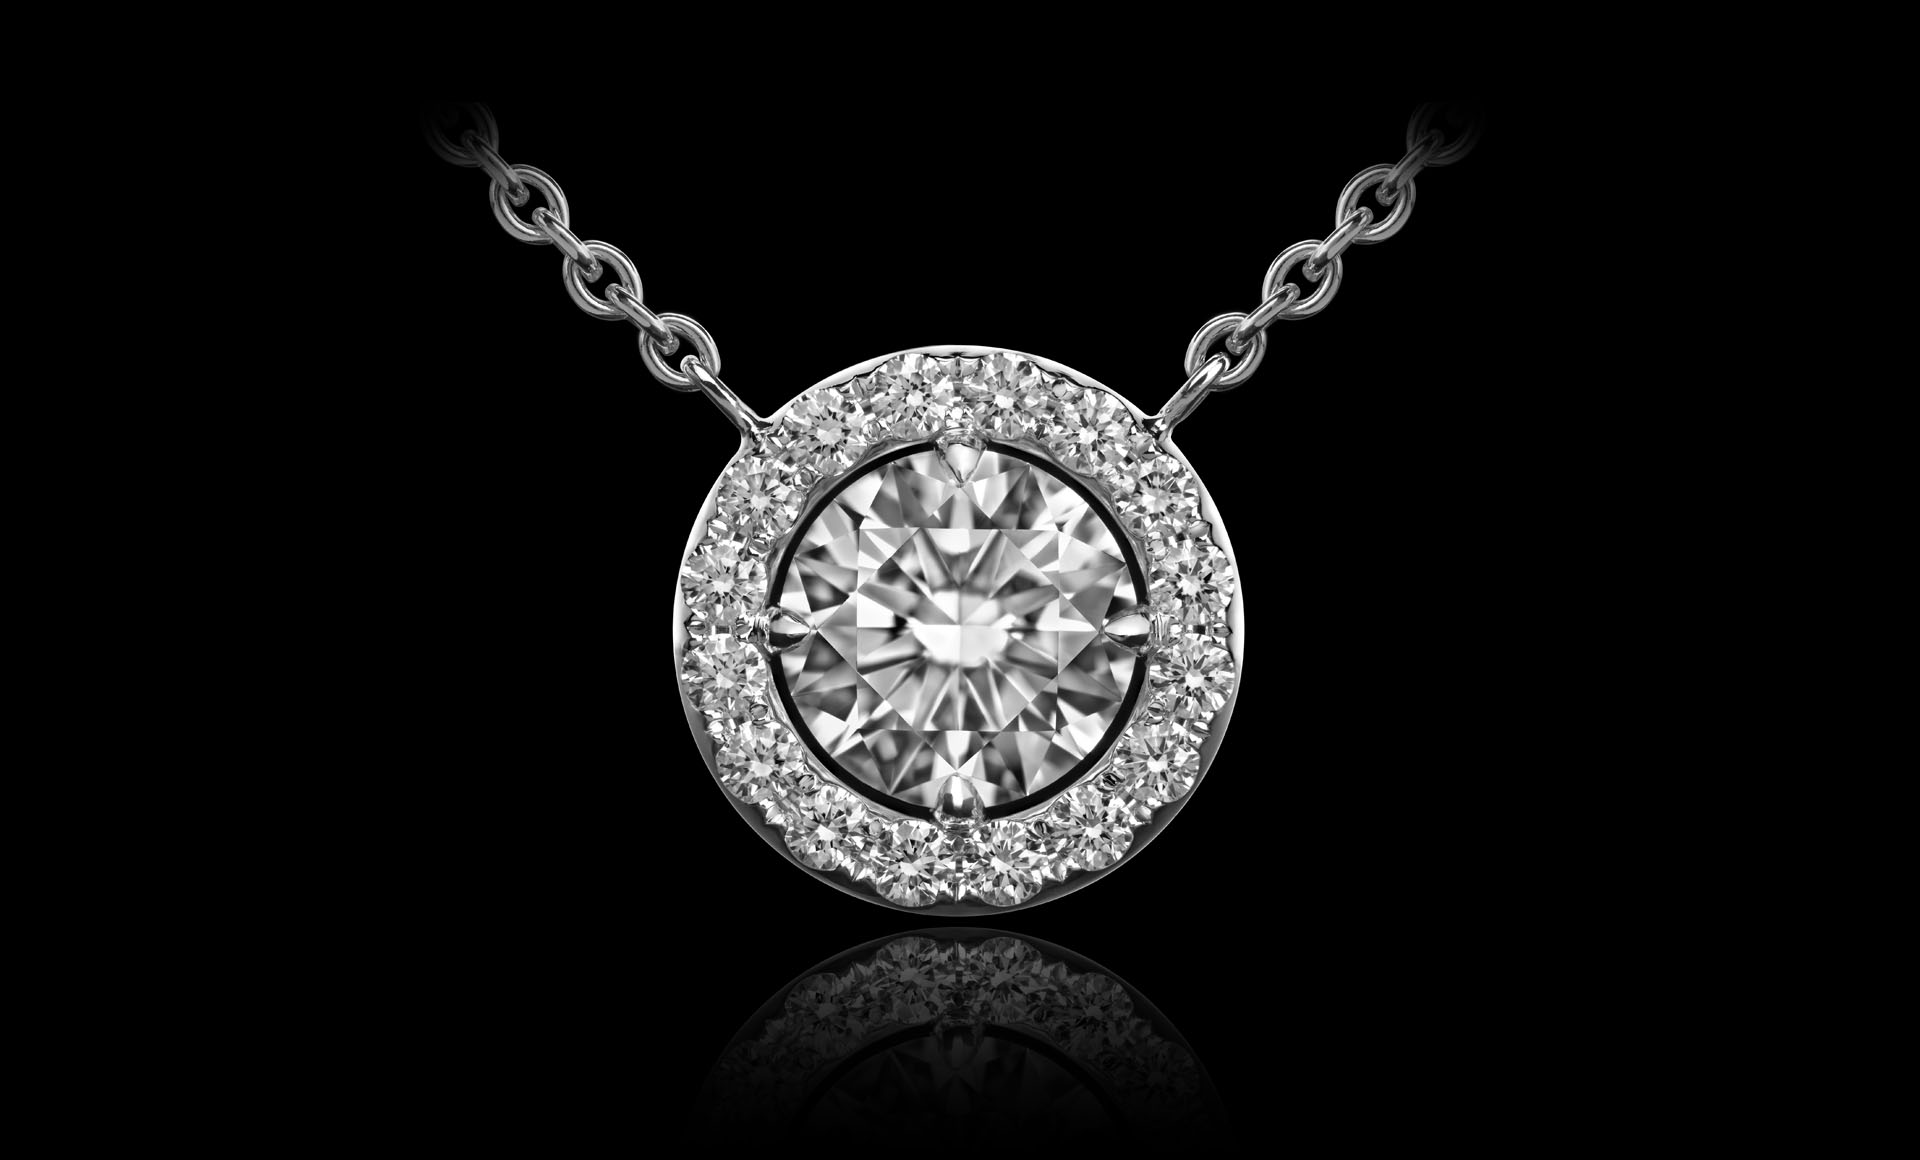 Orbit No.4 - Diamond pendant